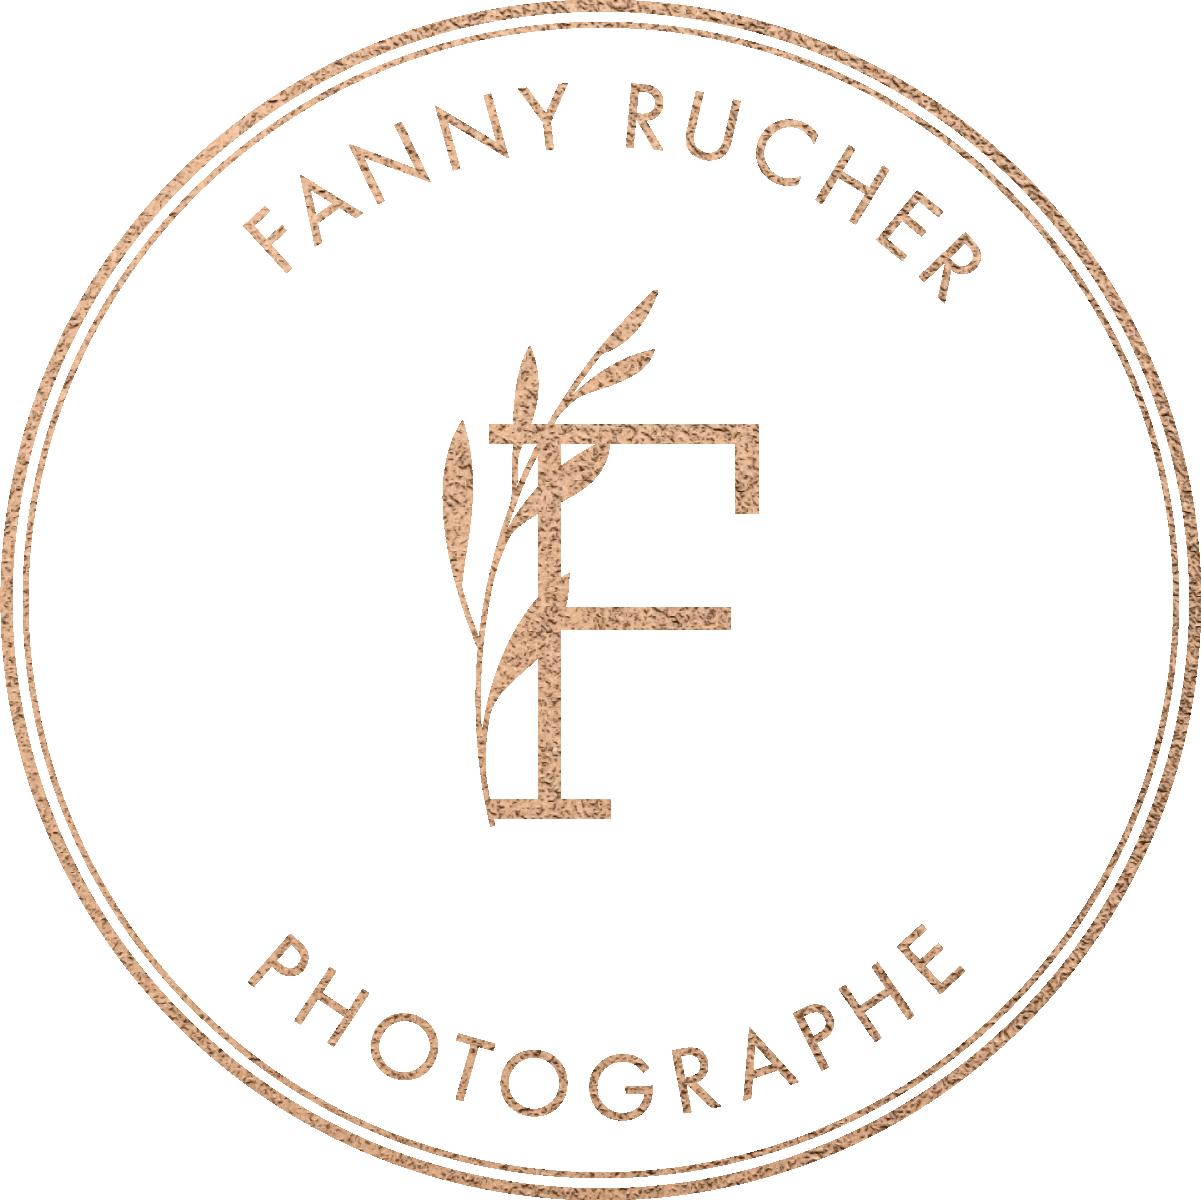 fanny-rucher-photographe-professionnelle-logo-8